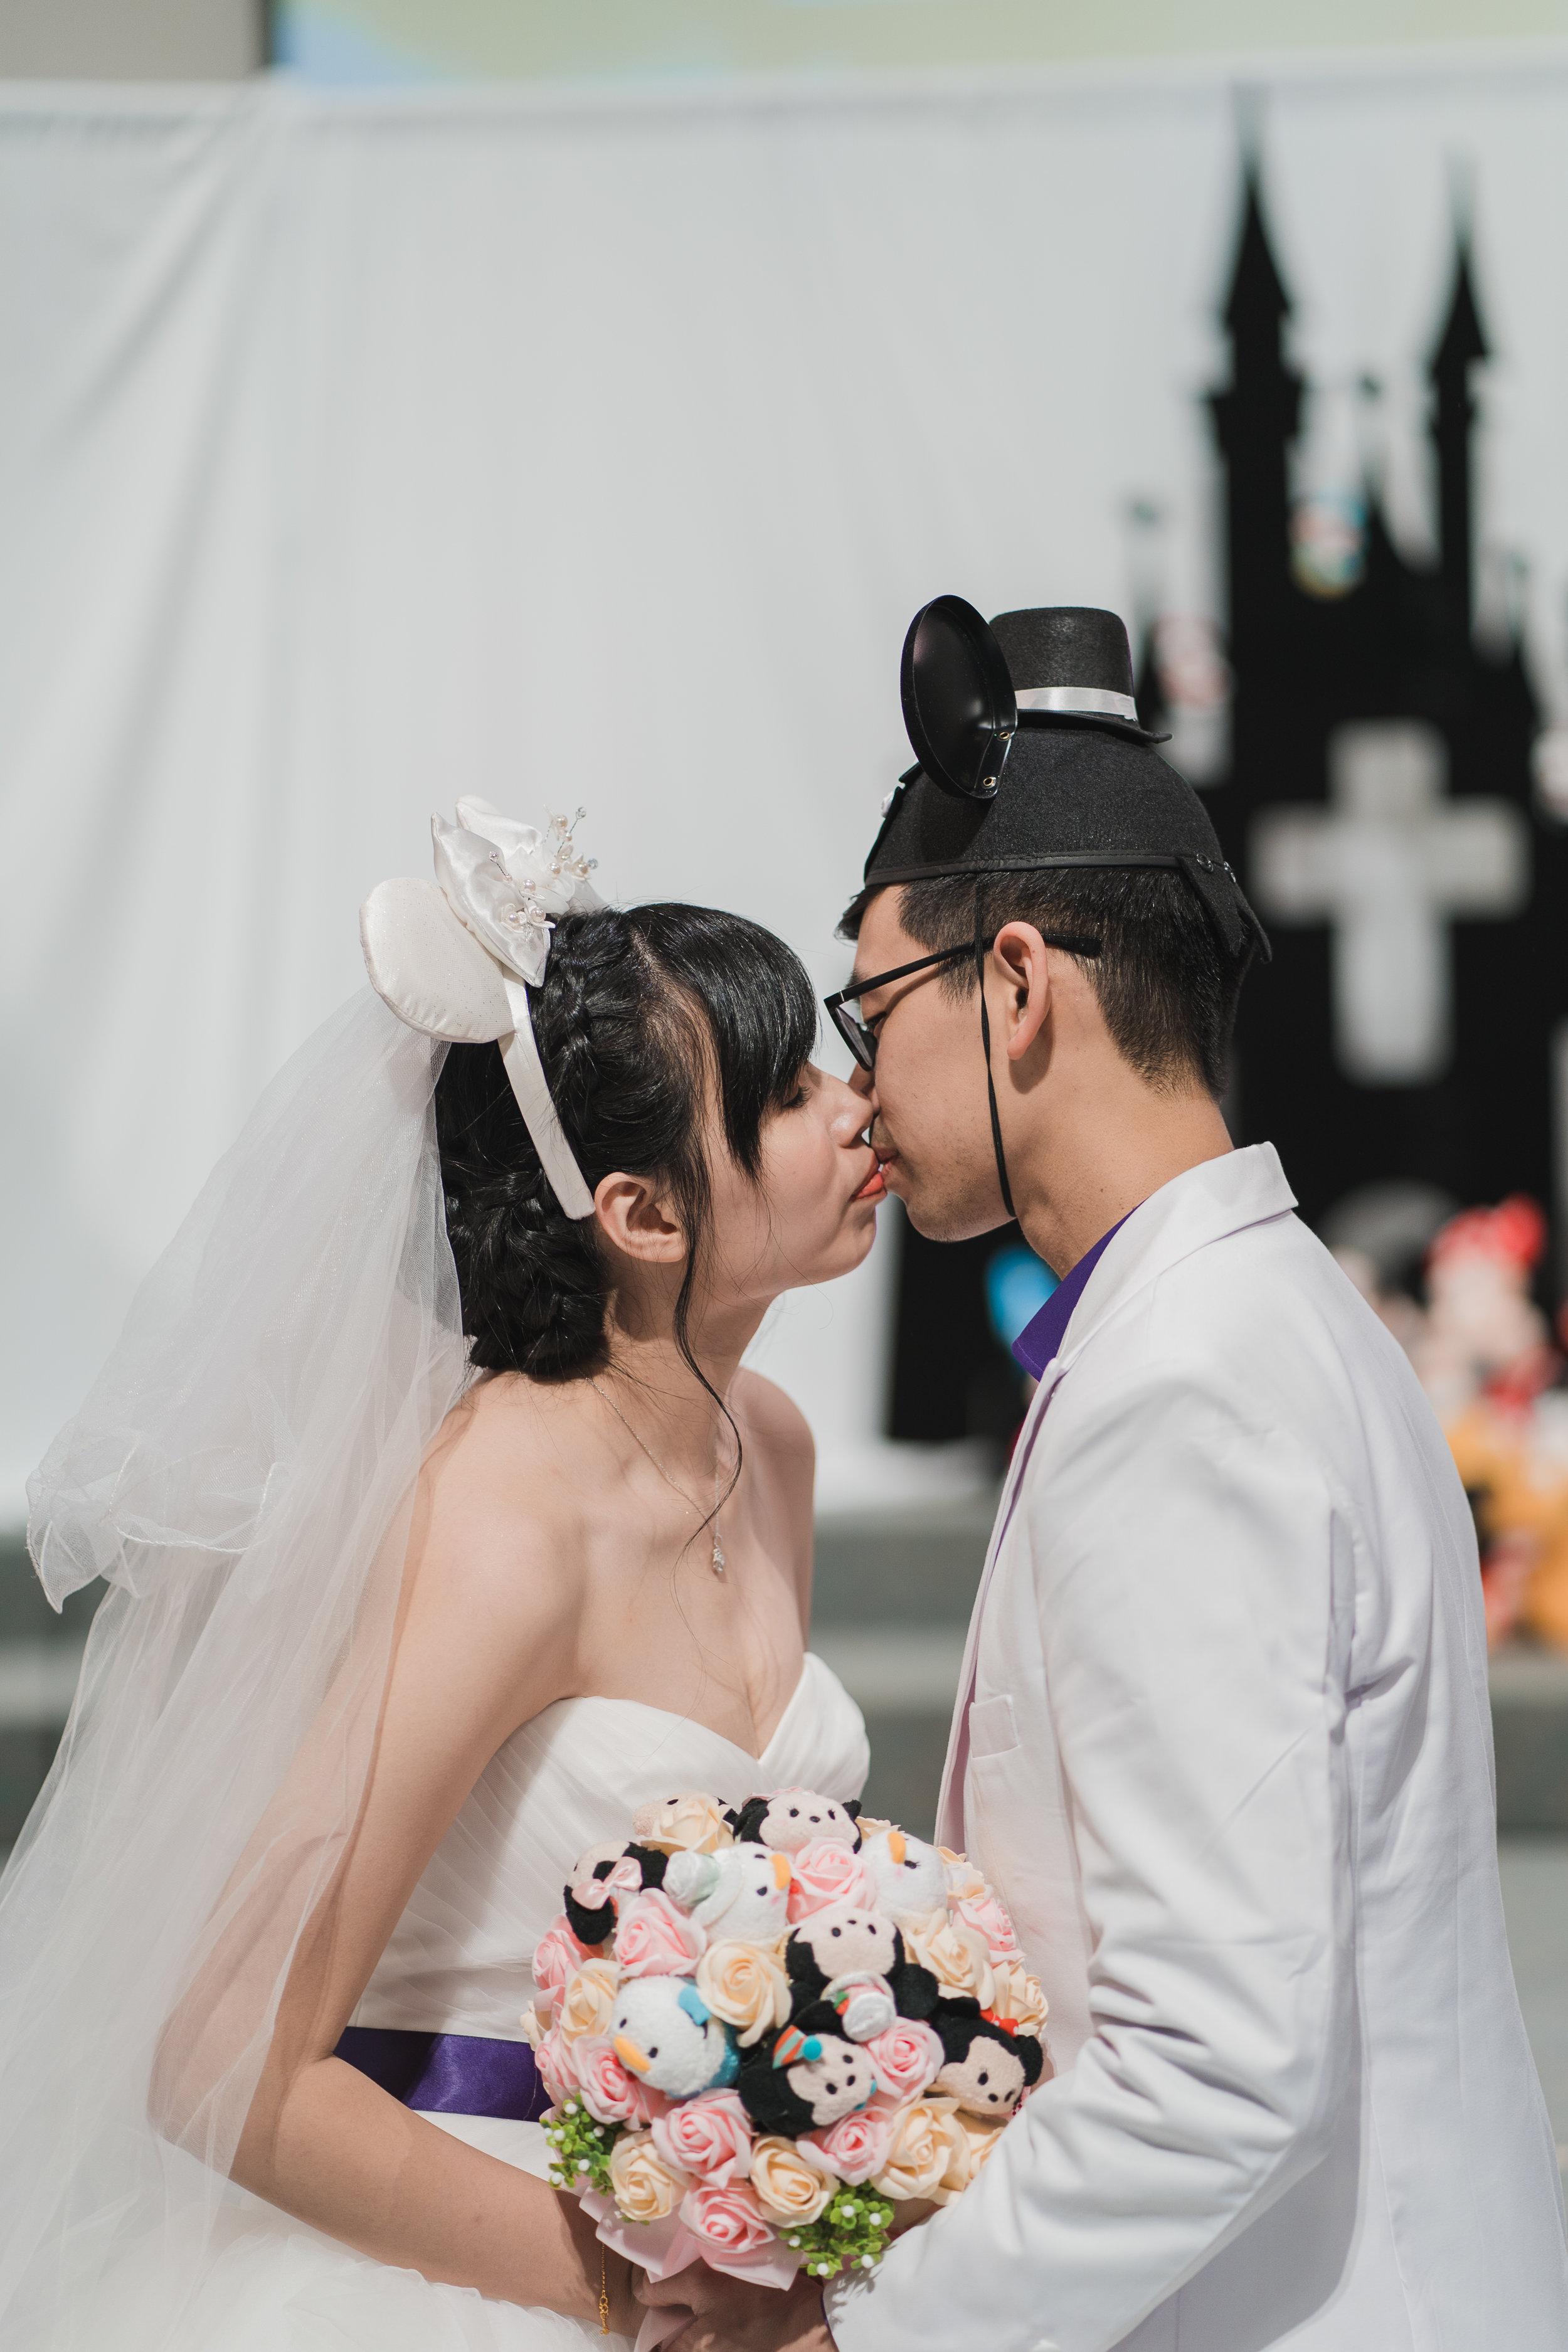 20190520 - Pamela & Matthew Wedding - 0190.jpg